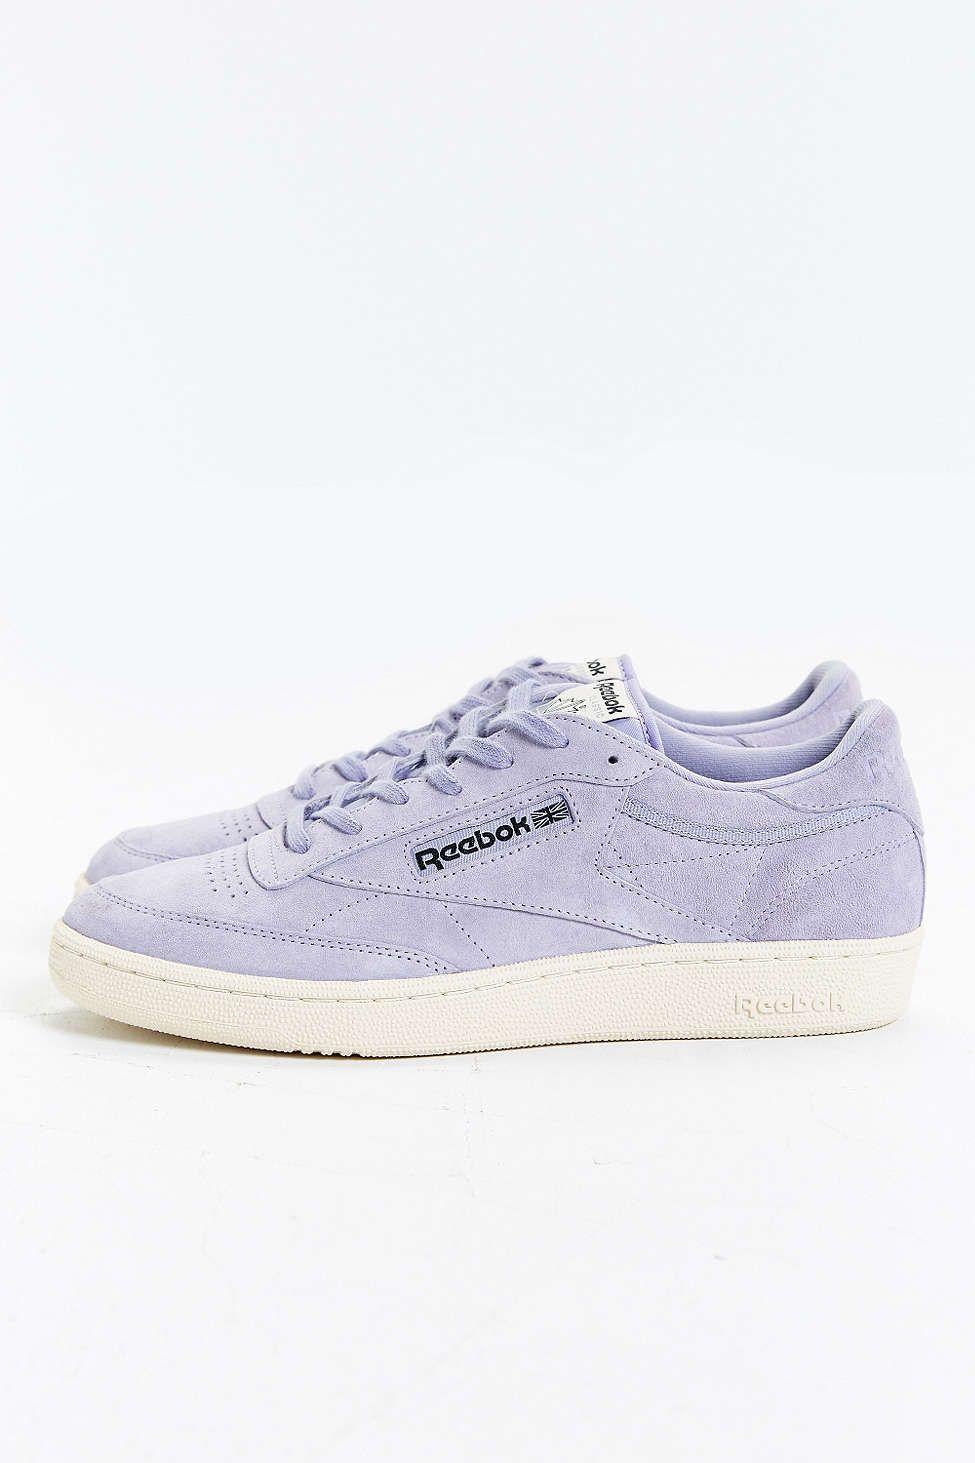 7d5b348372bb Reebok Club C 85 Pastel Sneaker | Shoes. <3 | Reebok club c ...